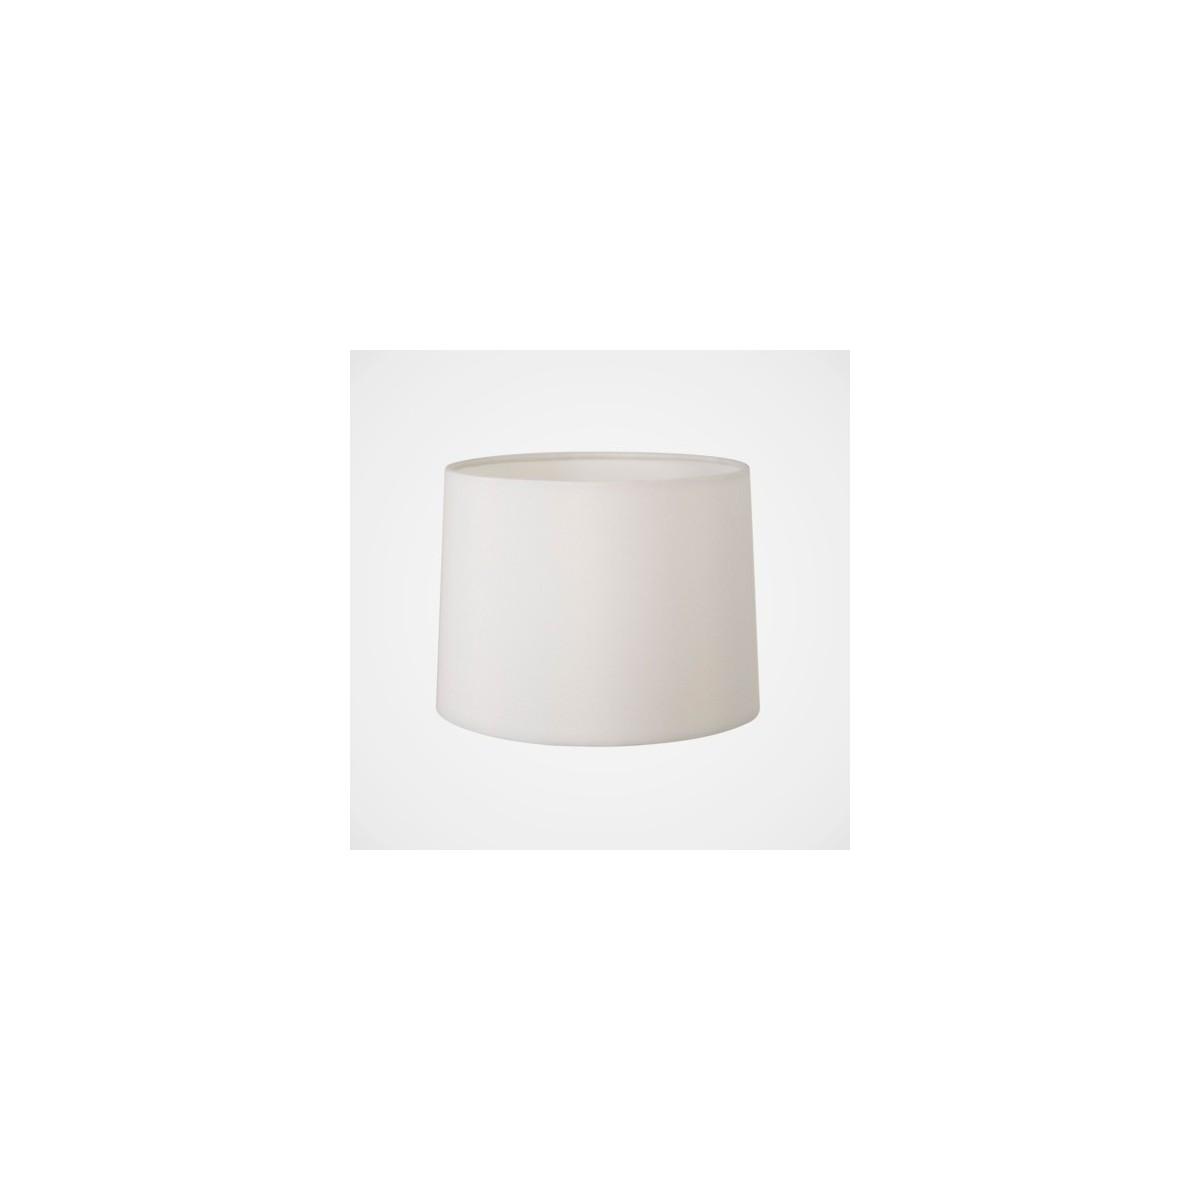 Astro Tapered Drum 177 Abażur Biały 5013001